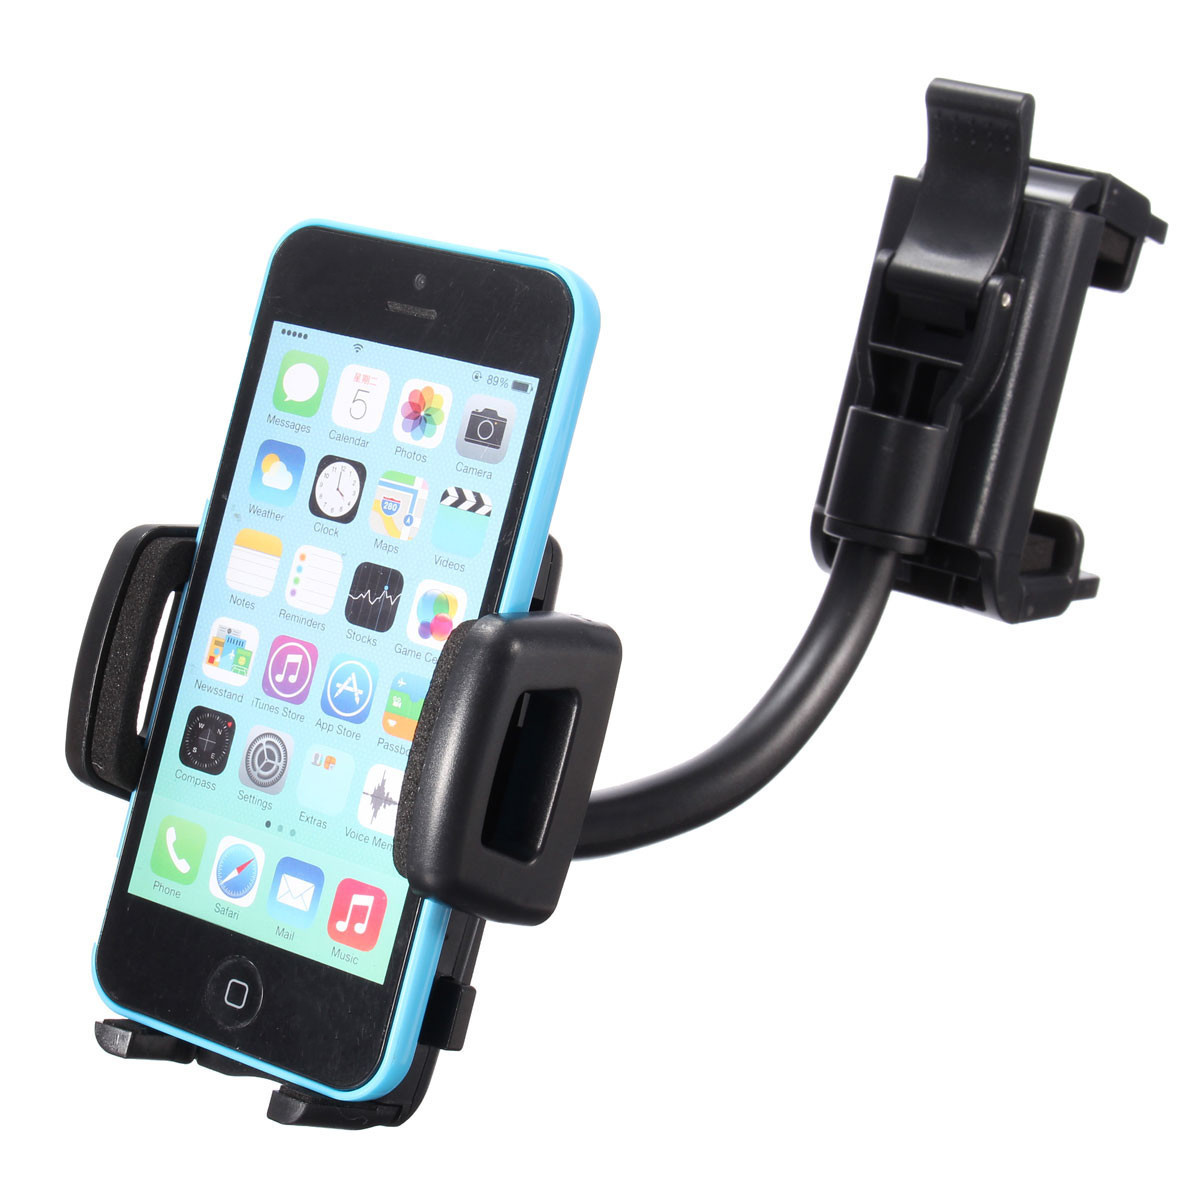 Car rearview mirror mount holder car reviews - Universal Car Rear View Mirror Mount Stand Holder For Smartphone Lazada Ph